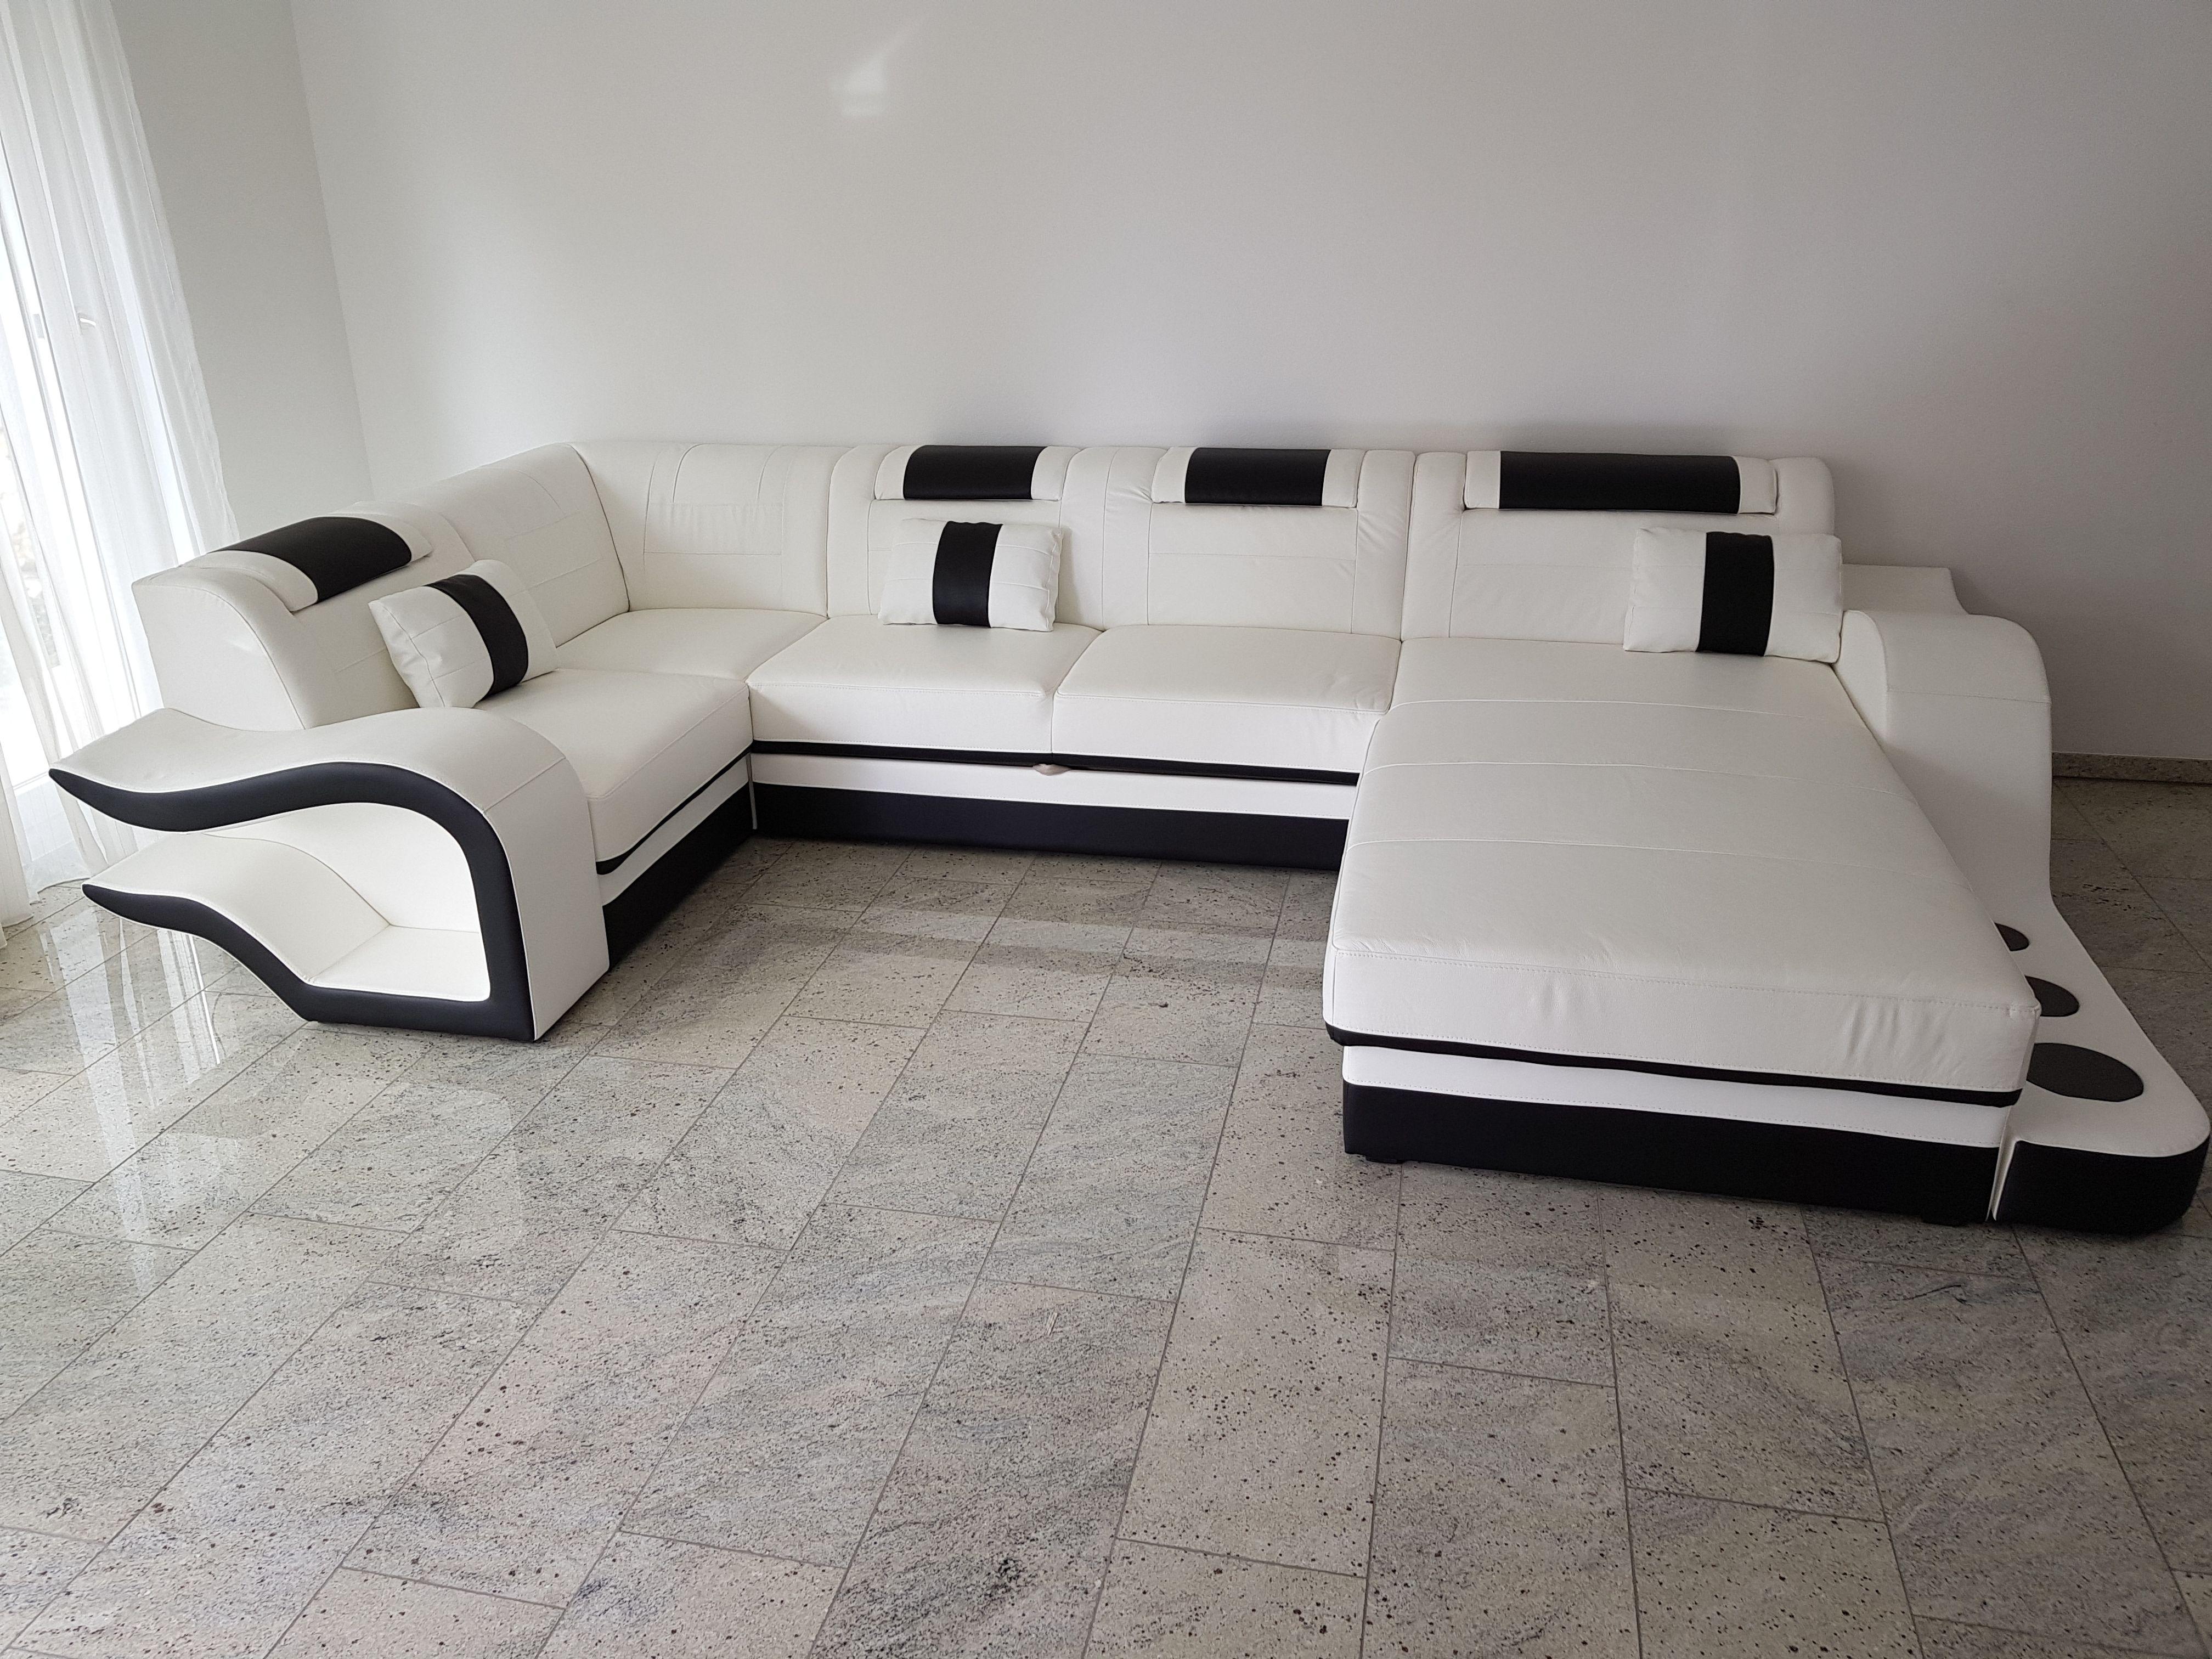 Designer Sofa Hermes Xl Mit Led Beleuchtung Kundenfotos Nativo